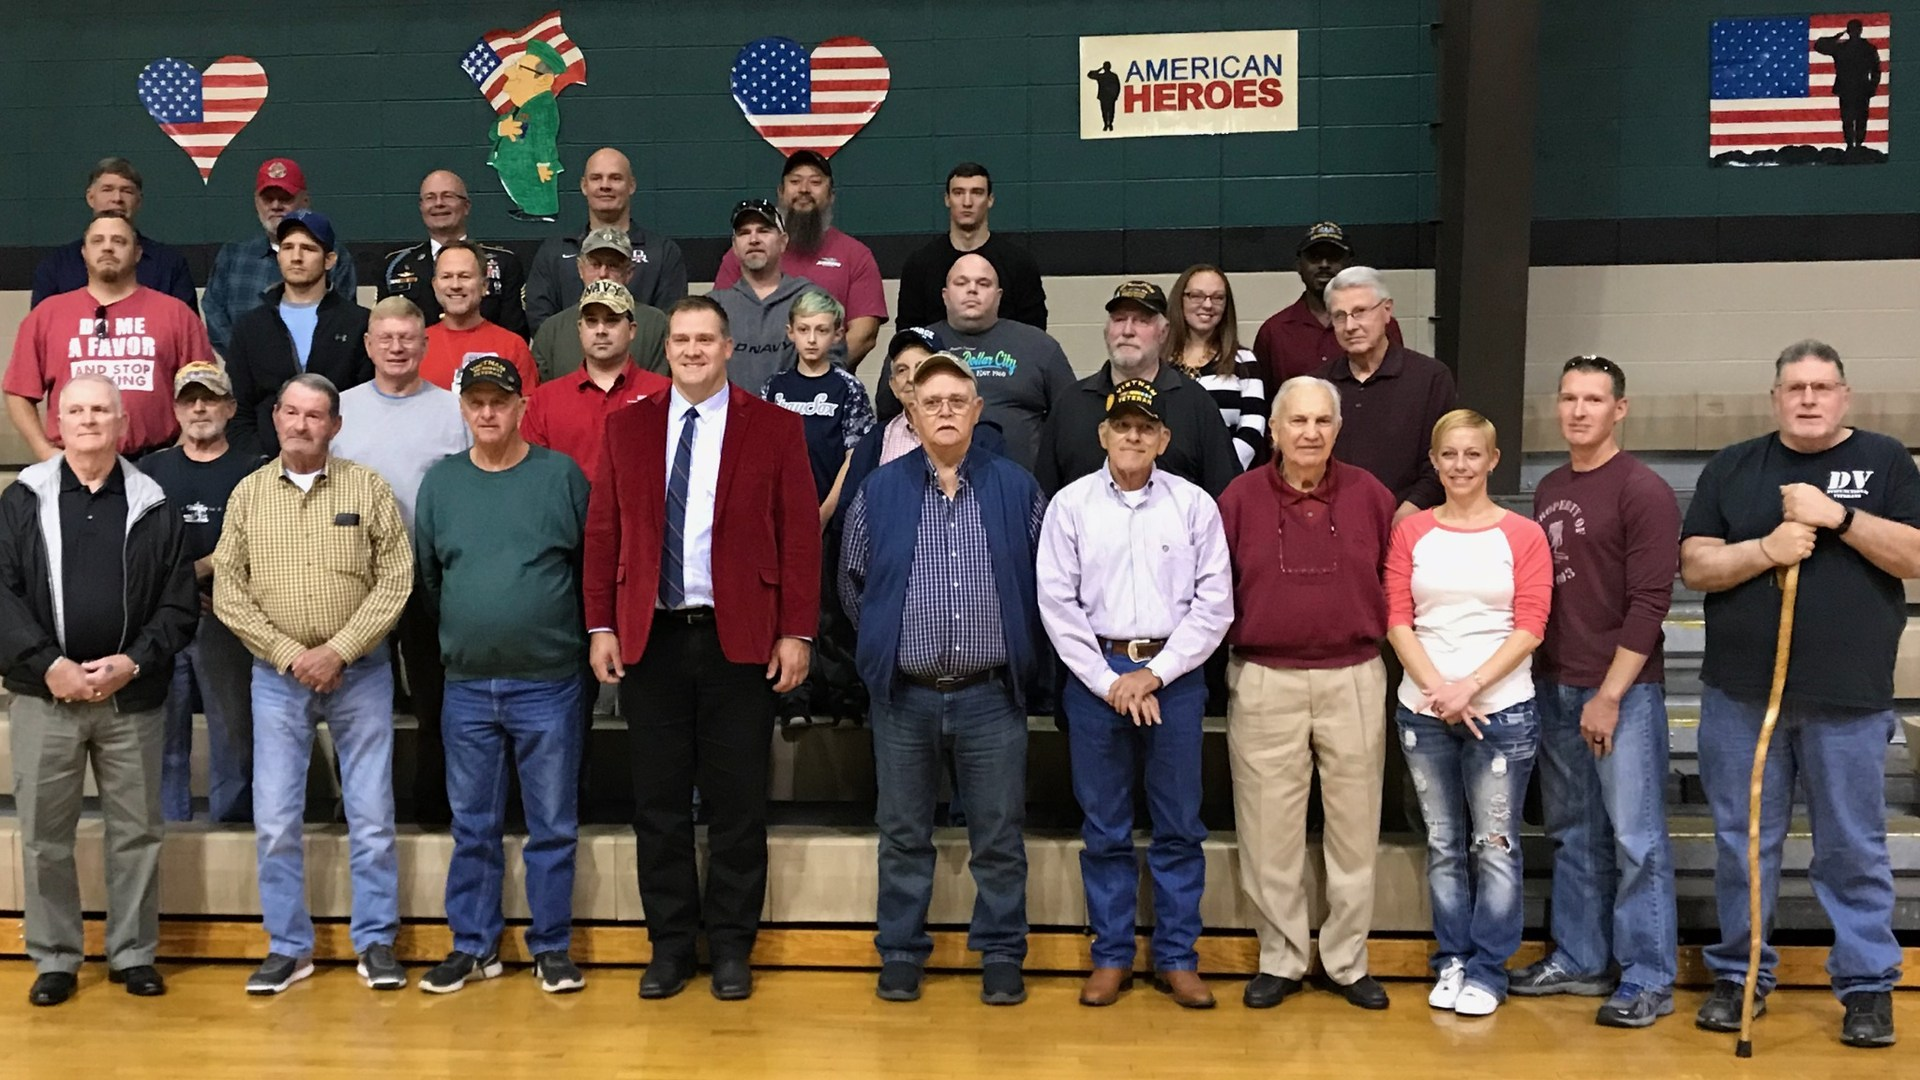 Veterans' Day Photo